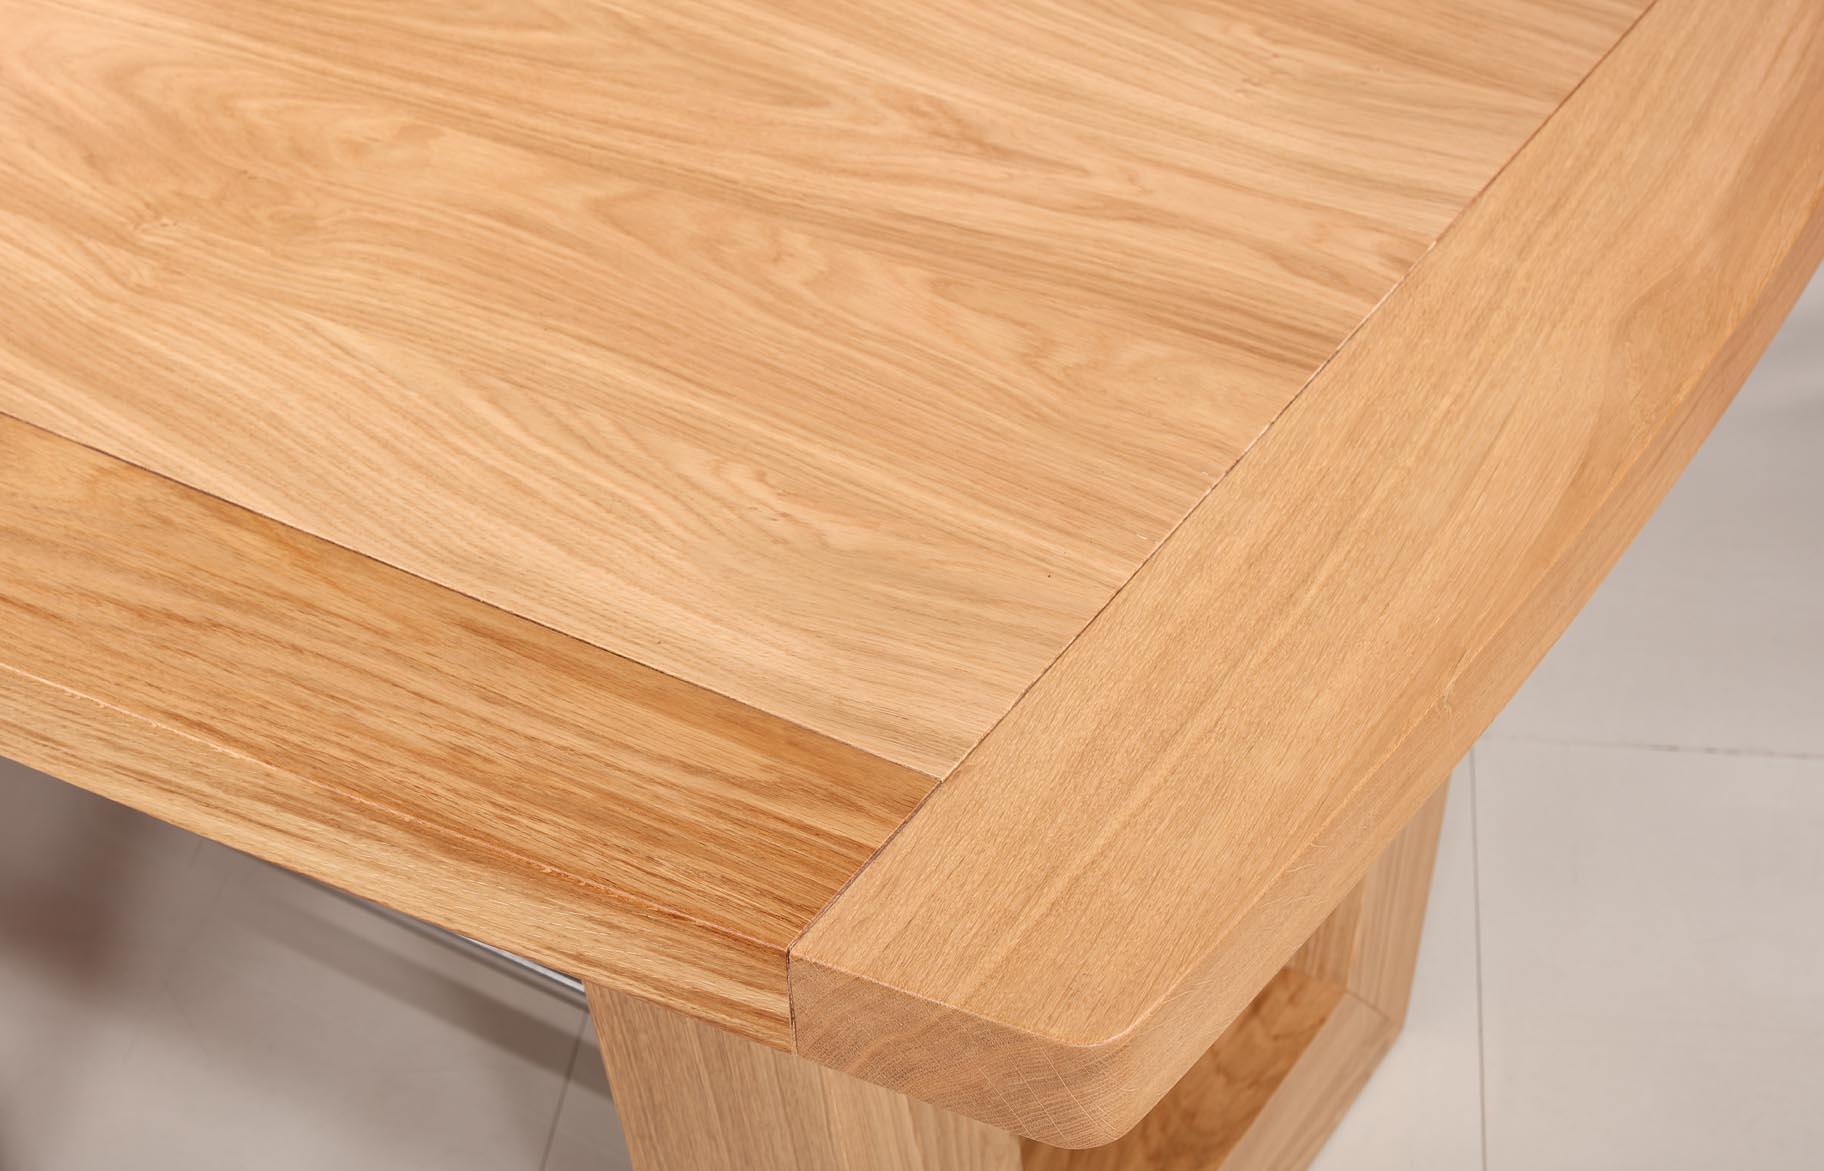 C57 Mesa rectangular 220x110 en madera de roble maciza línea ...